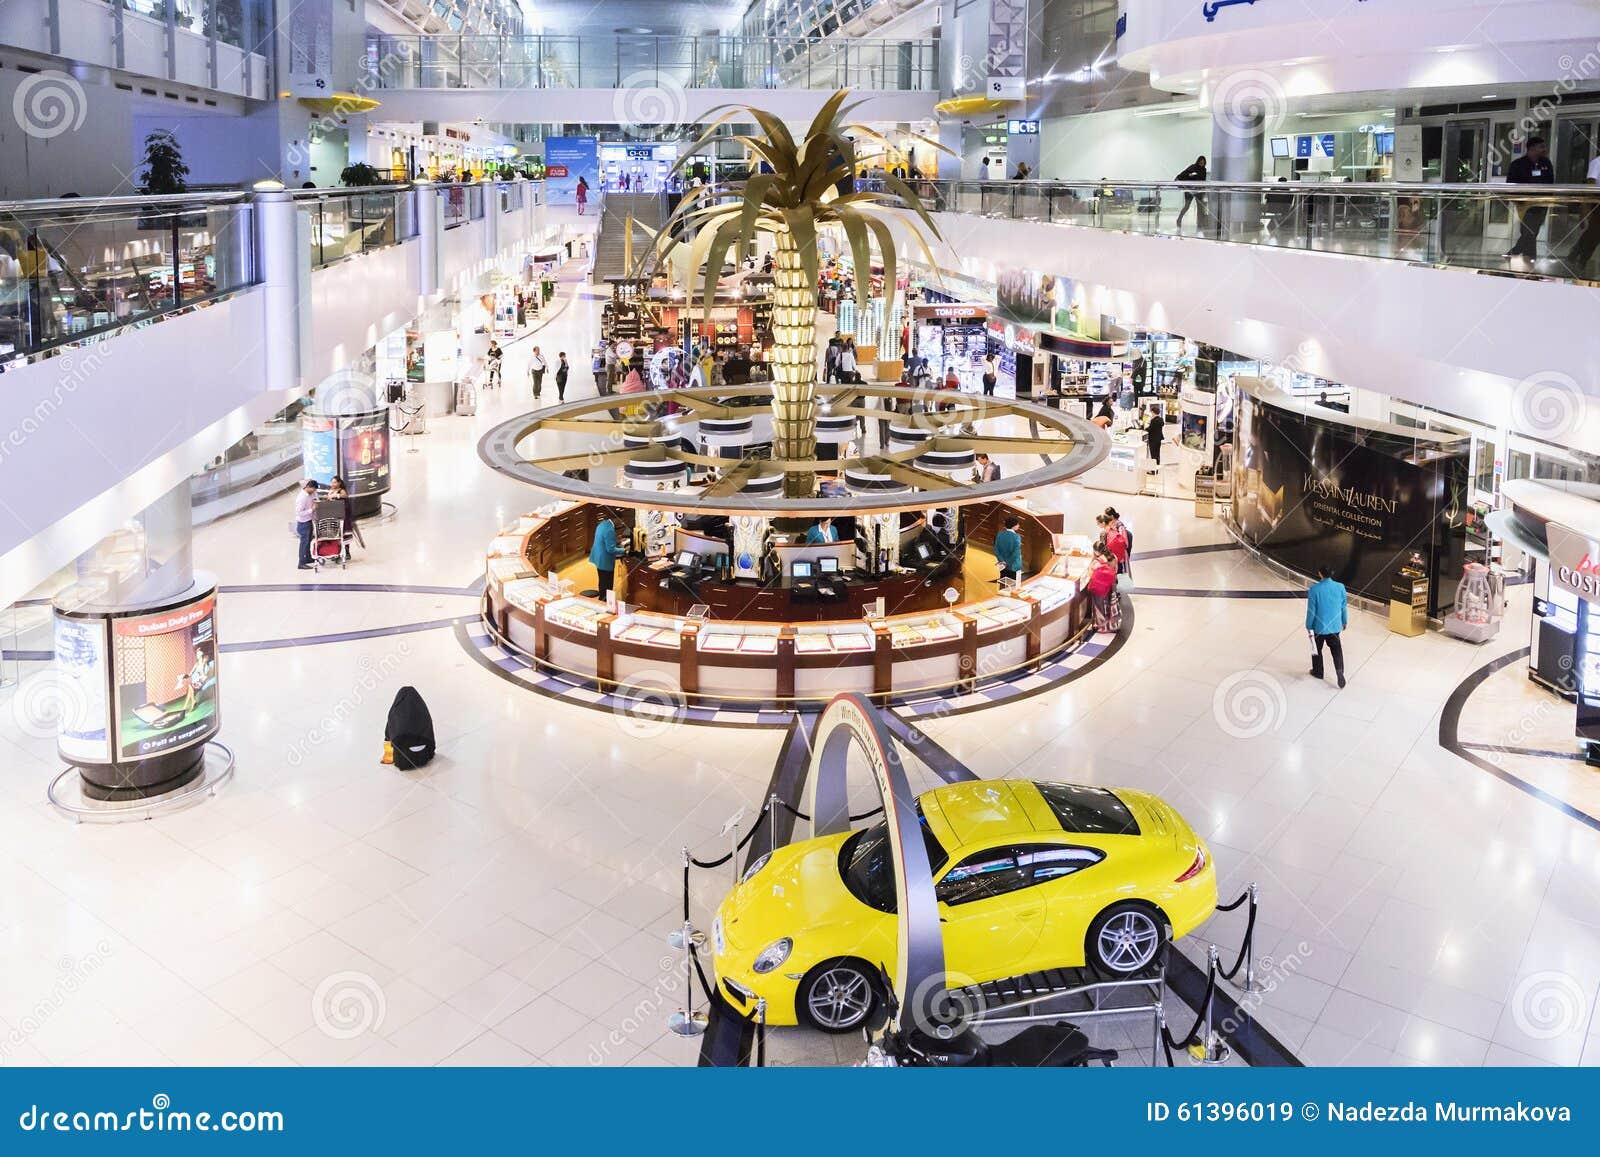 DUBAI INTERNATIONAL AIRPORT 9 March 2015.